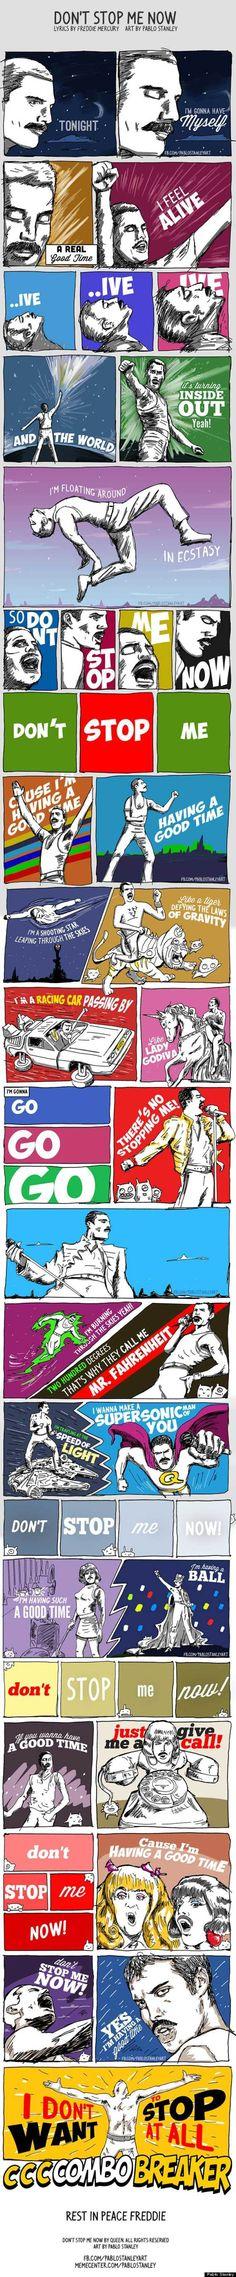 Retweet @Sam McHardy Jones Post: The best Freddie Mercury comic you'll ever see